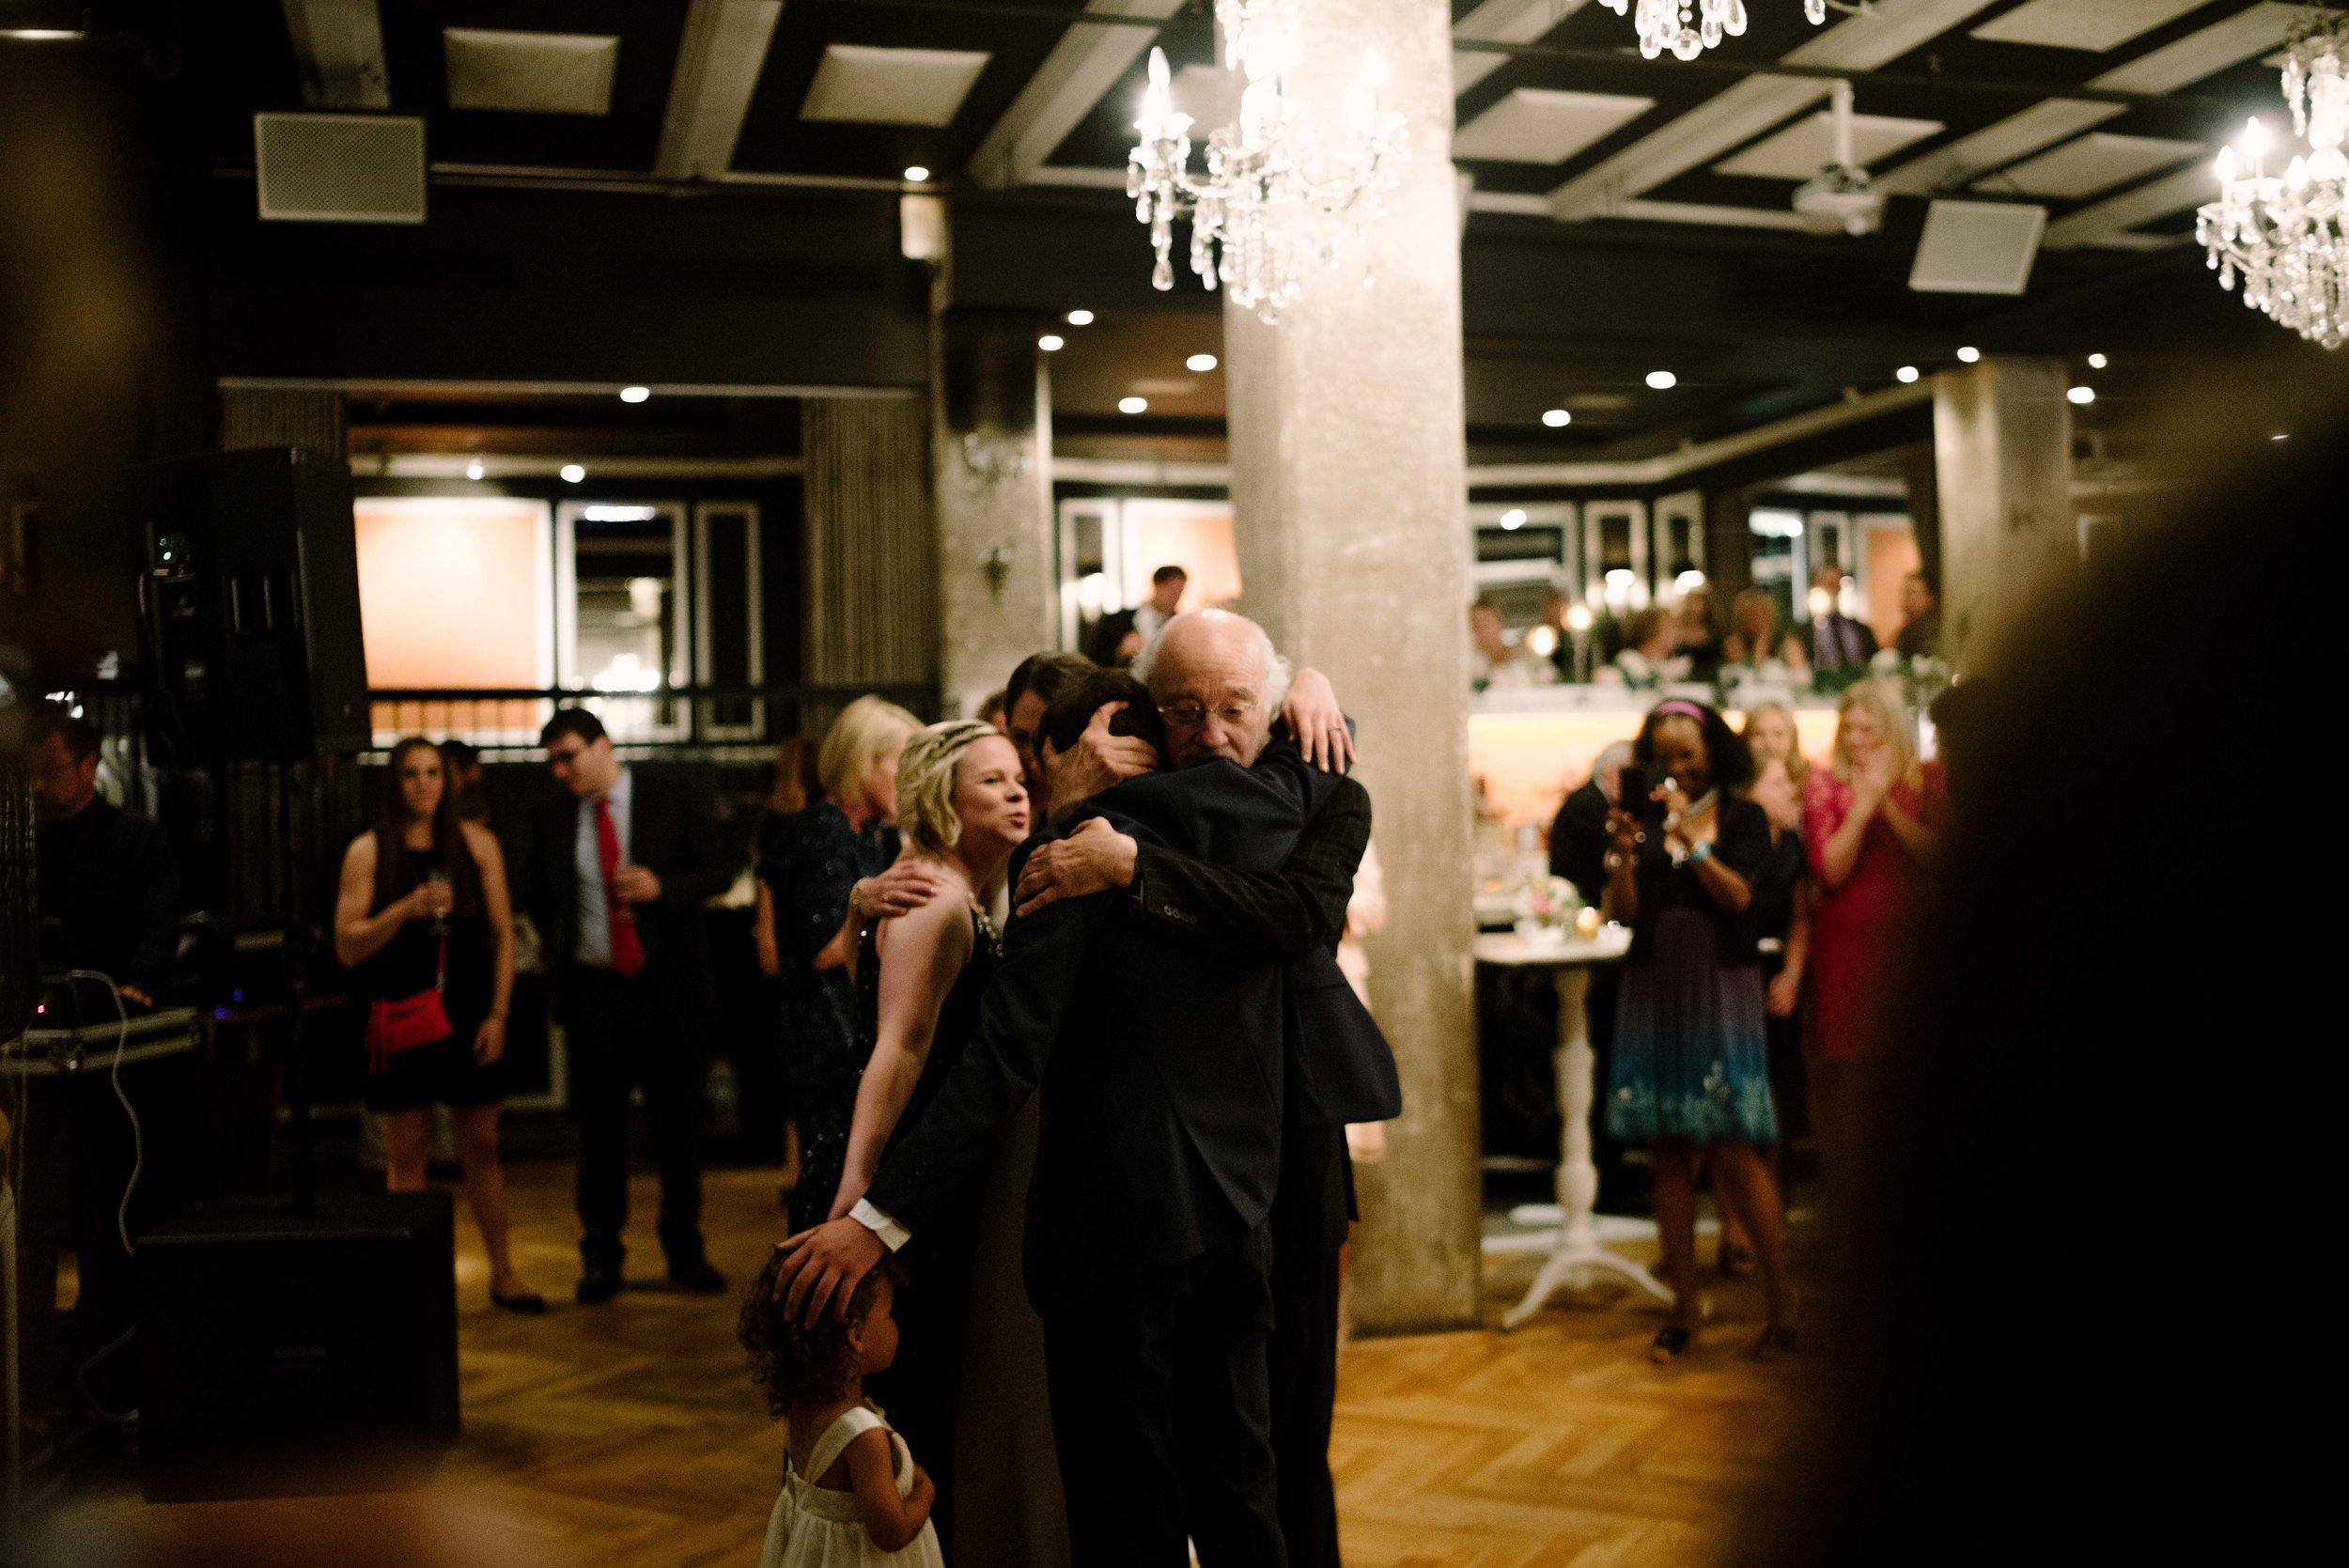 Patricia-Steve-Blog-Indianapolis-Wedding-120.jpg